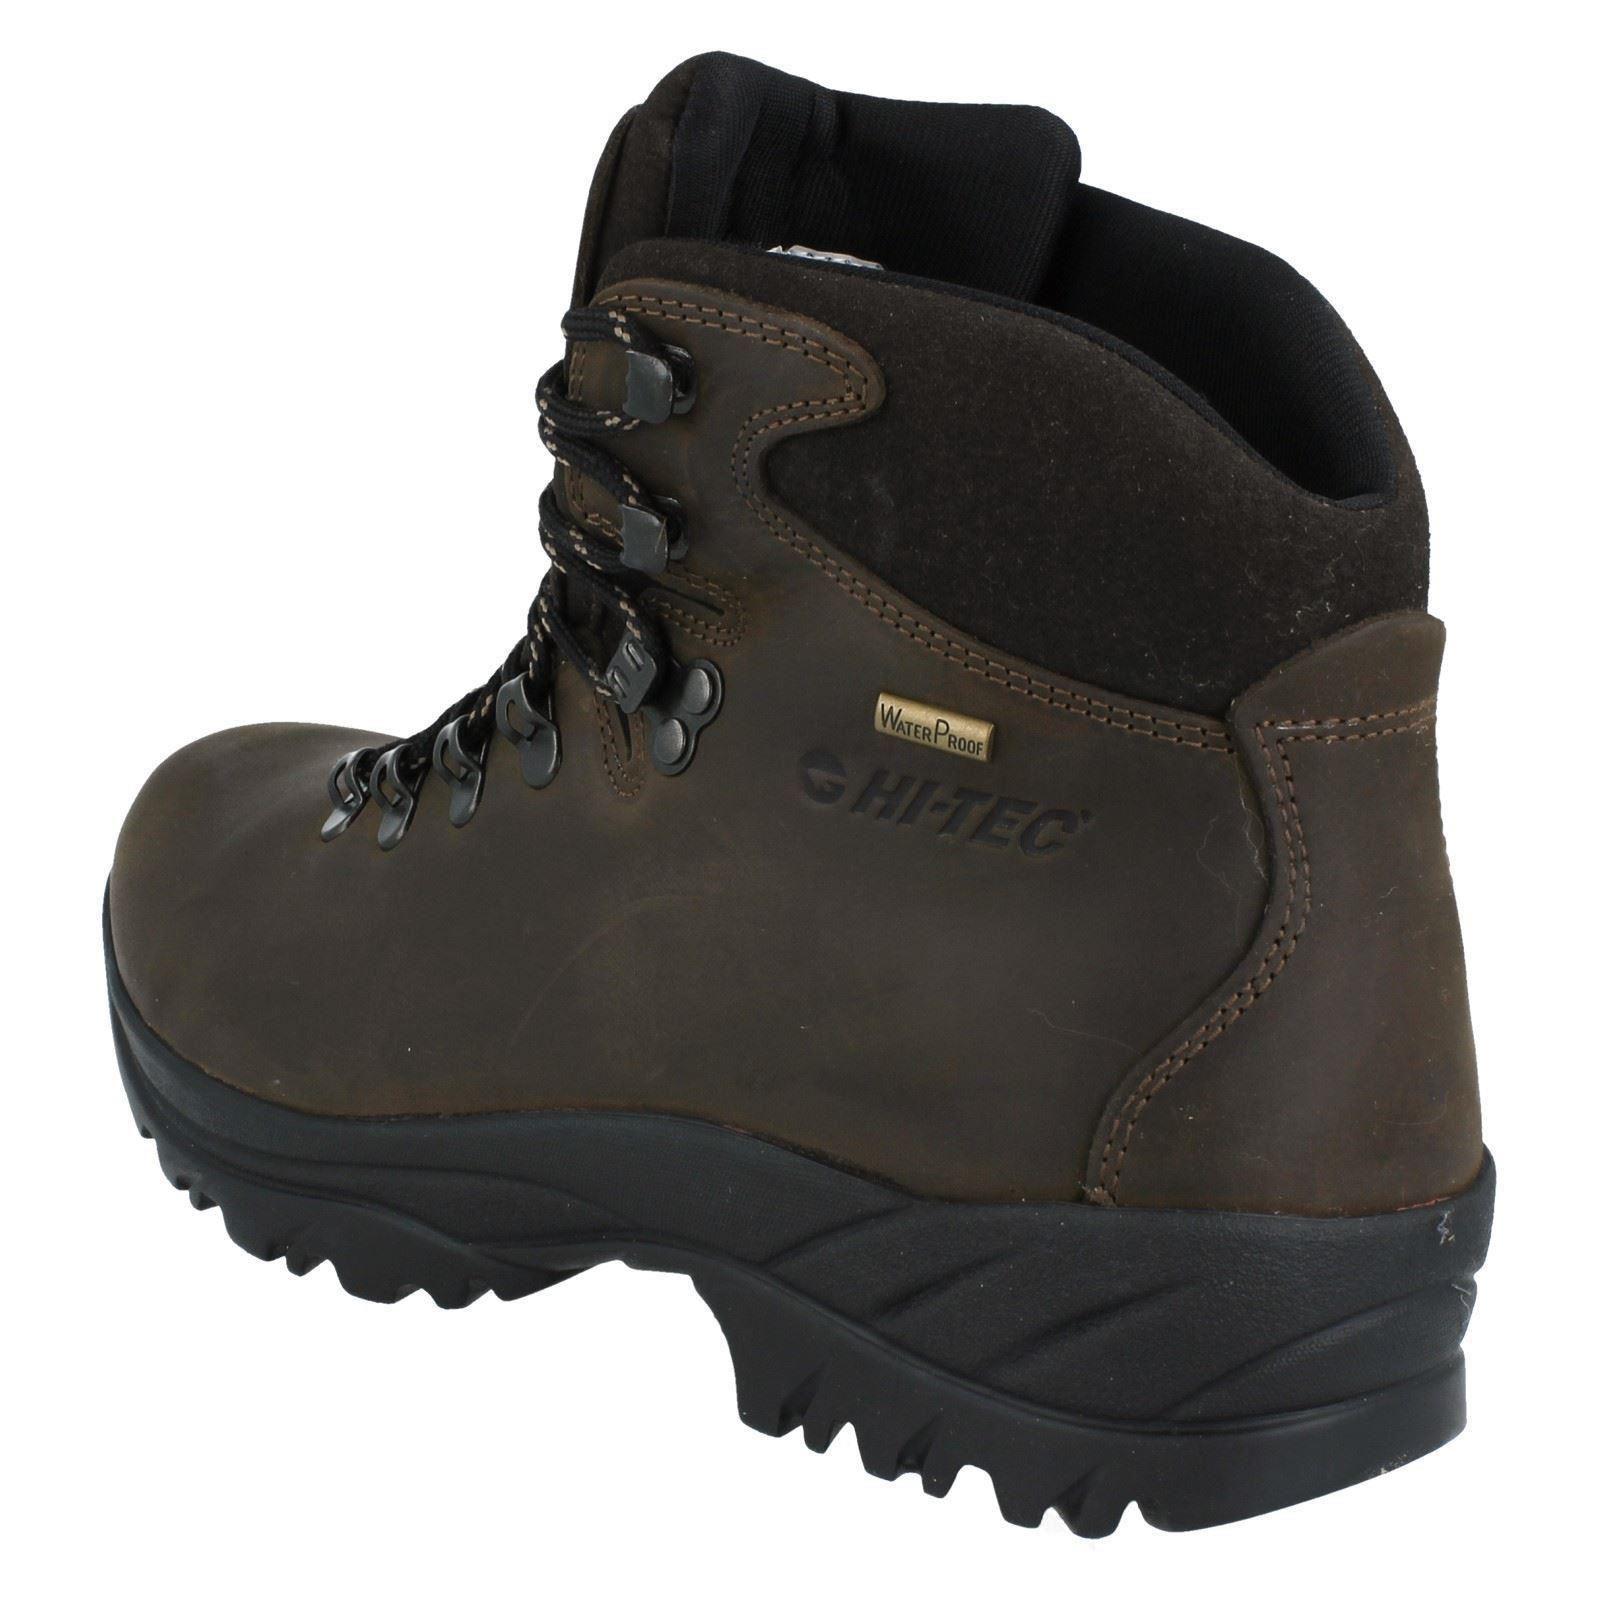 Ravine WP Mens Hi-Tec Waterproof Walking Boots